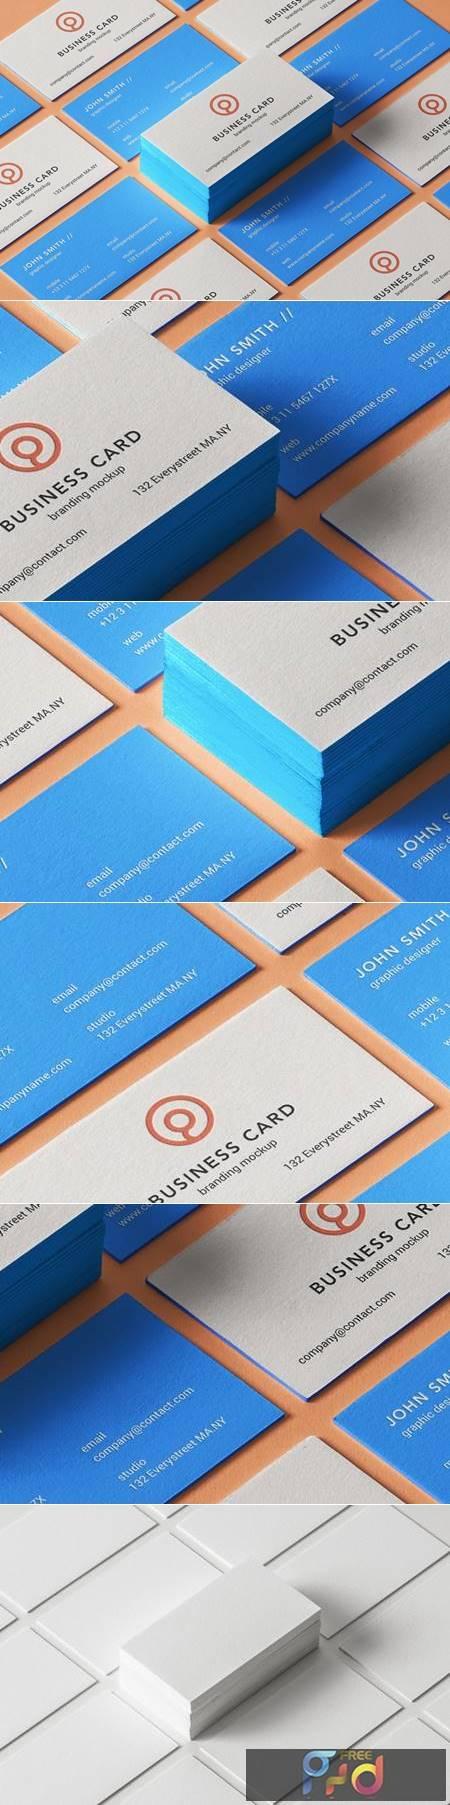 Psd Business Card Branding Mockup 7 1344 1